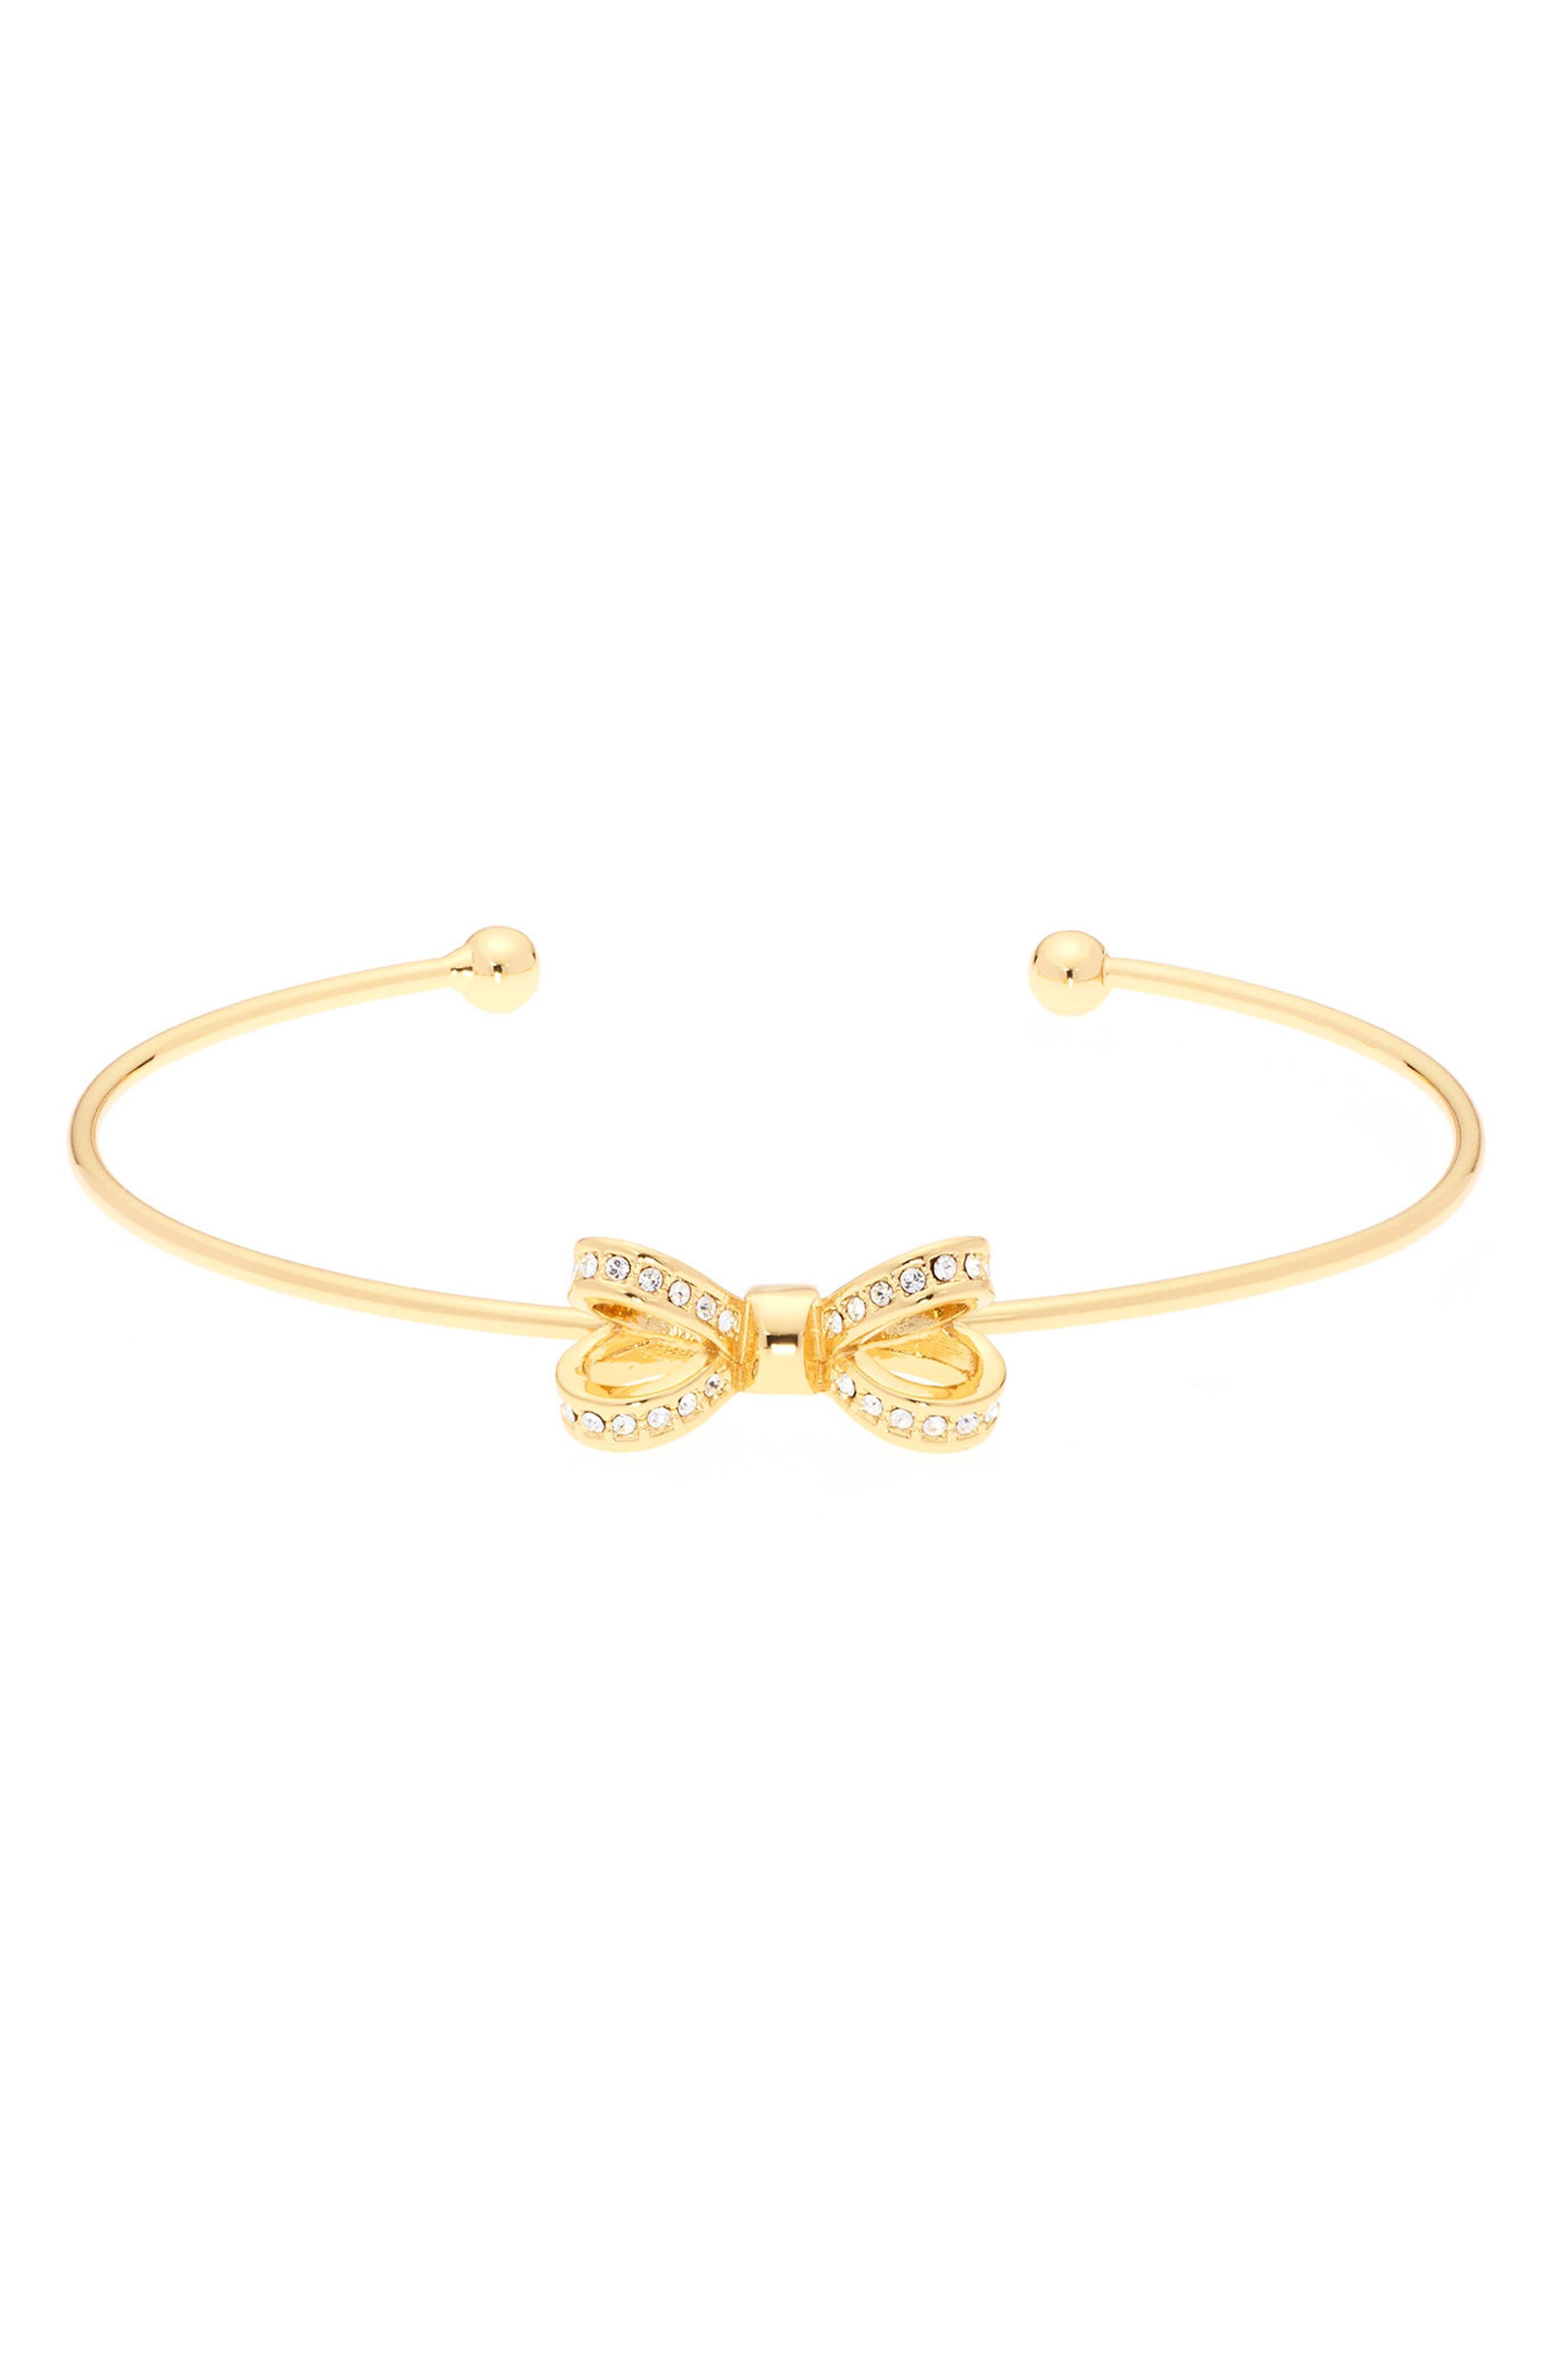 Ted Baker London Mini Opulent Pavé Bow Cuff Bracelet